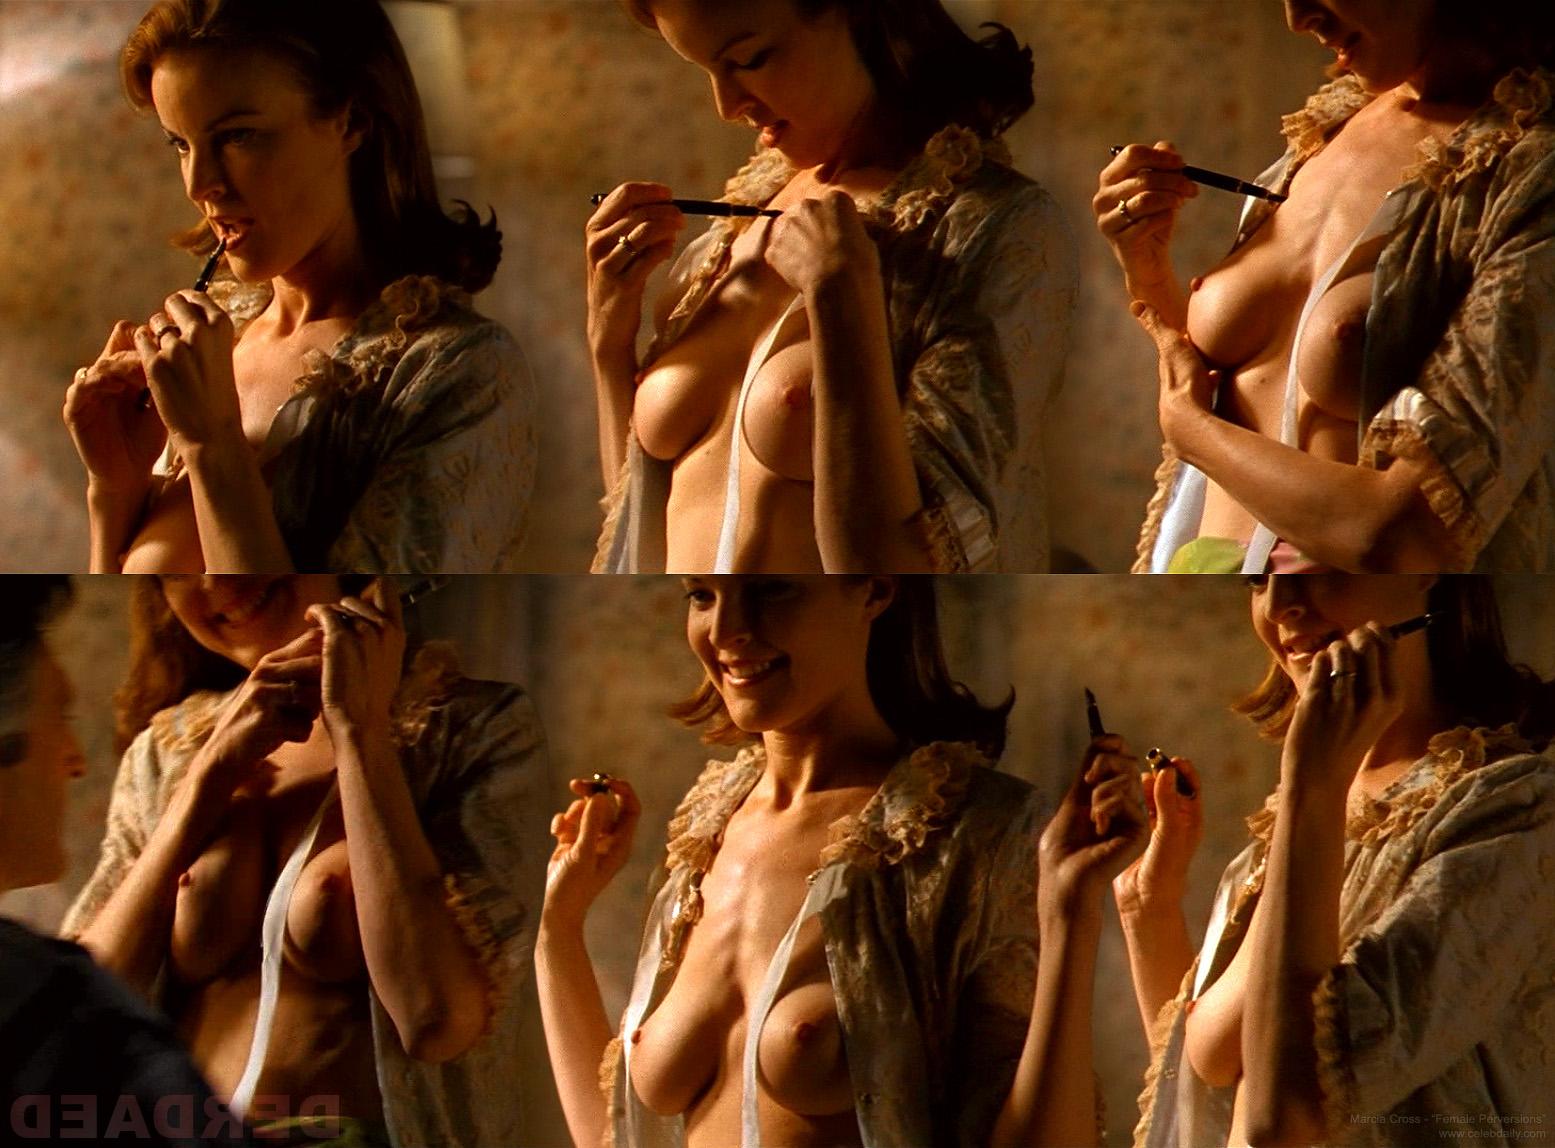 Marcia cross free nude